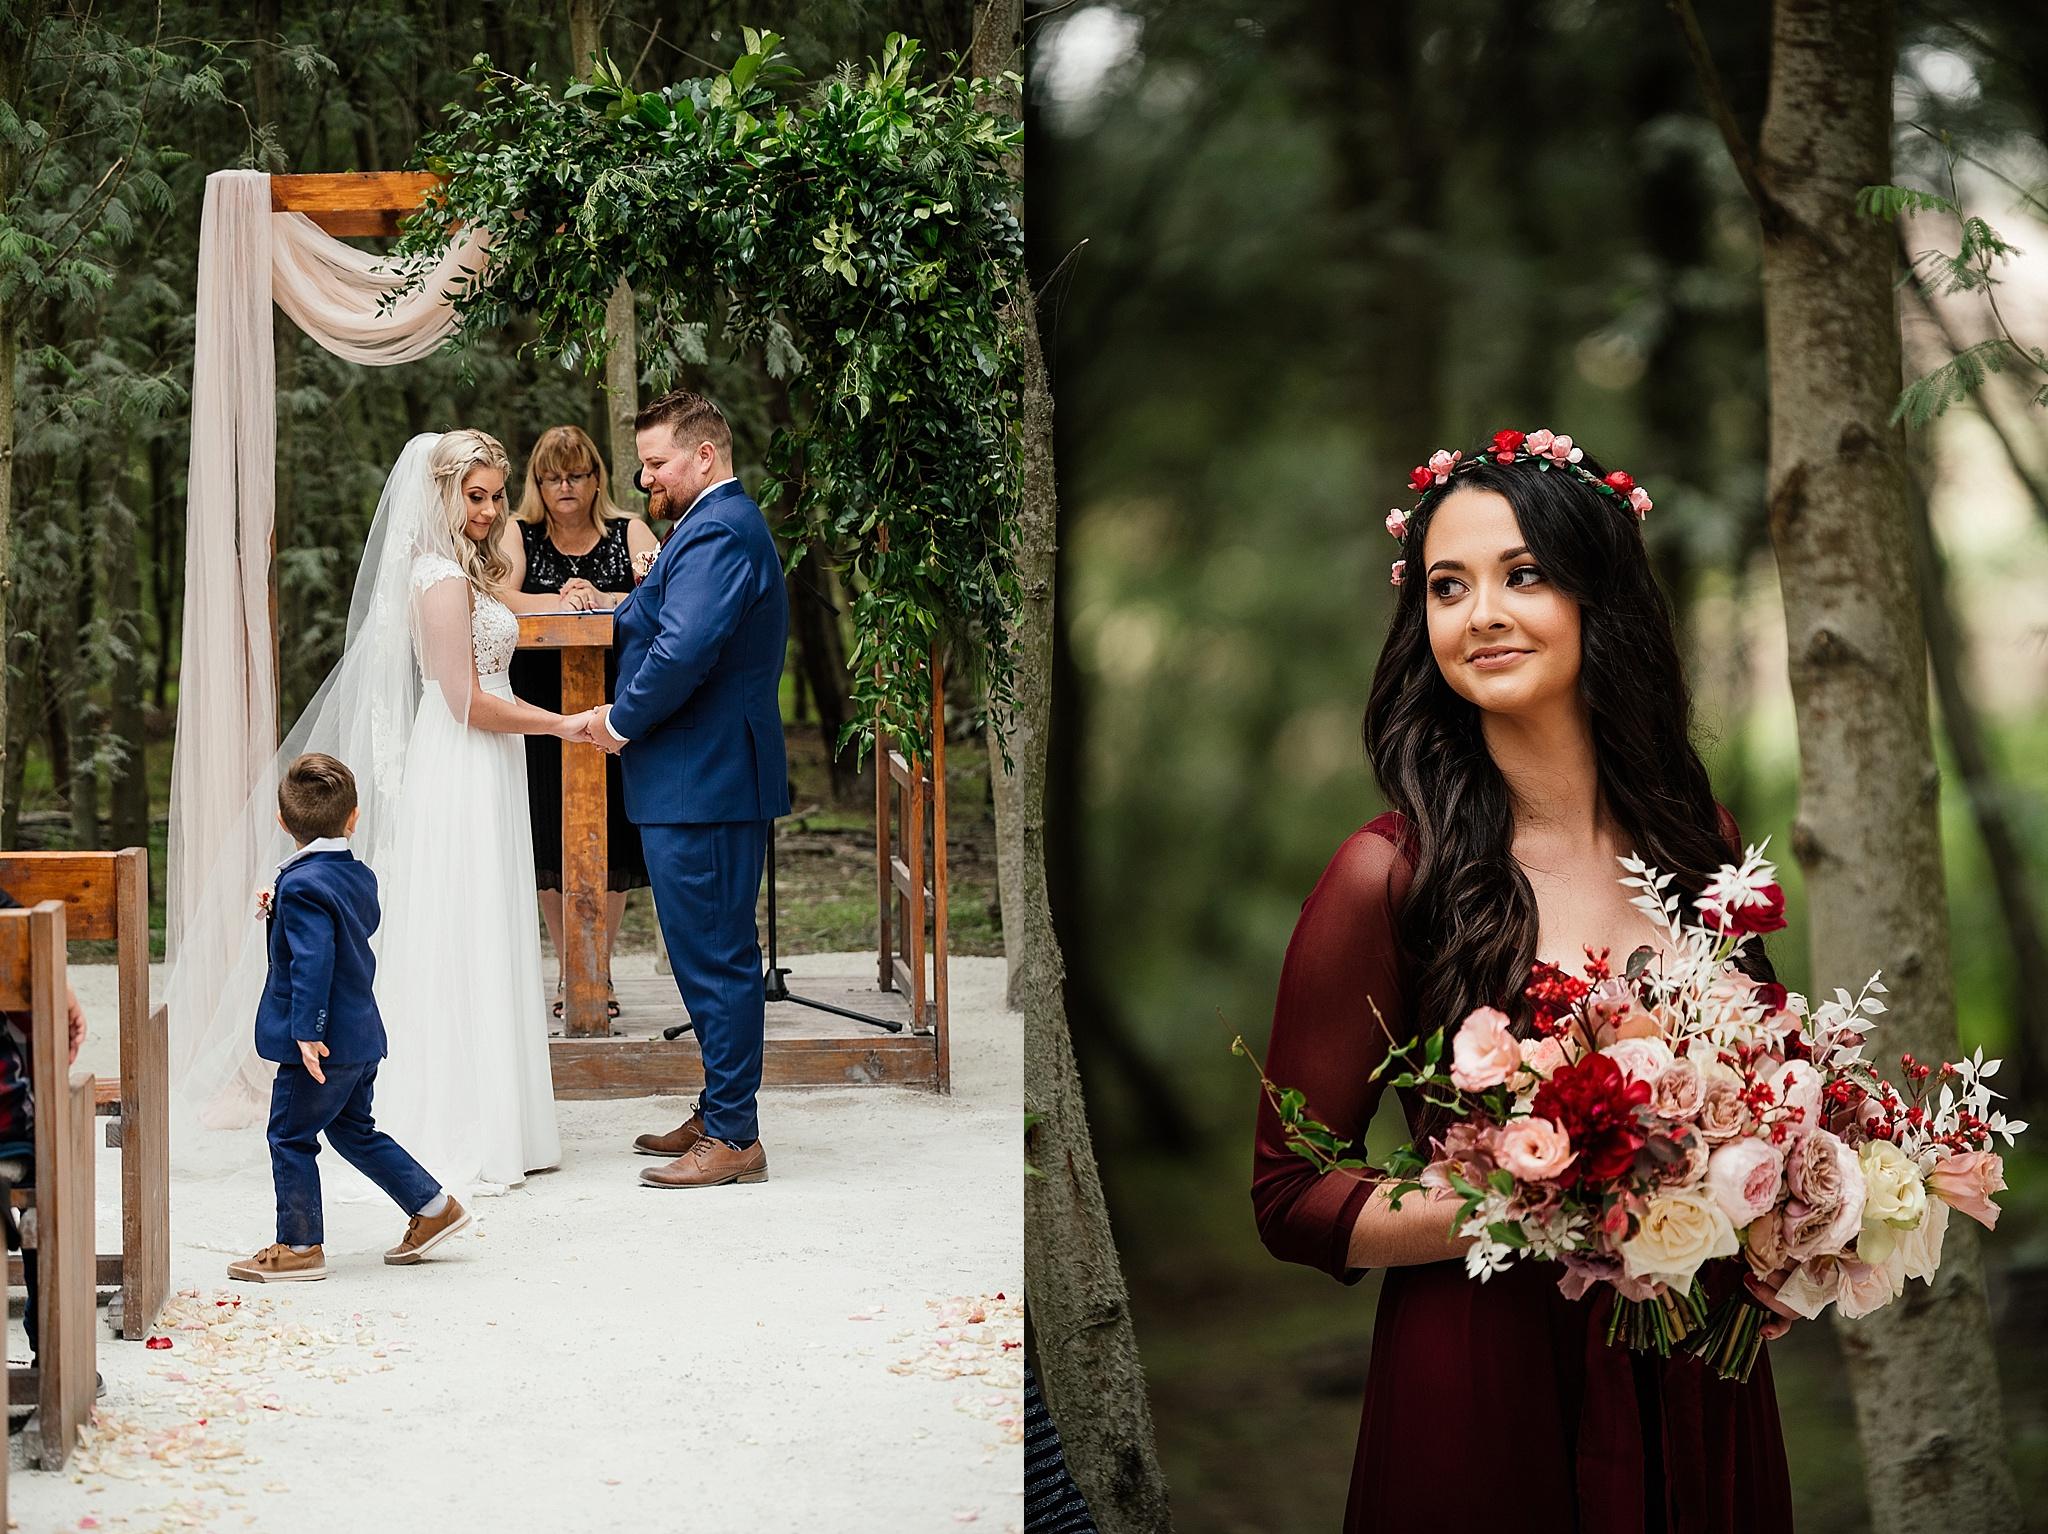 Cape Town Photographer Darren Bester - Die Woud Wedding - Gareth & Roxanne_0020.jpg